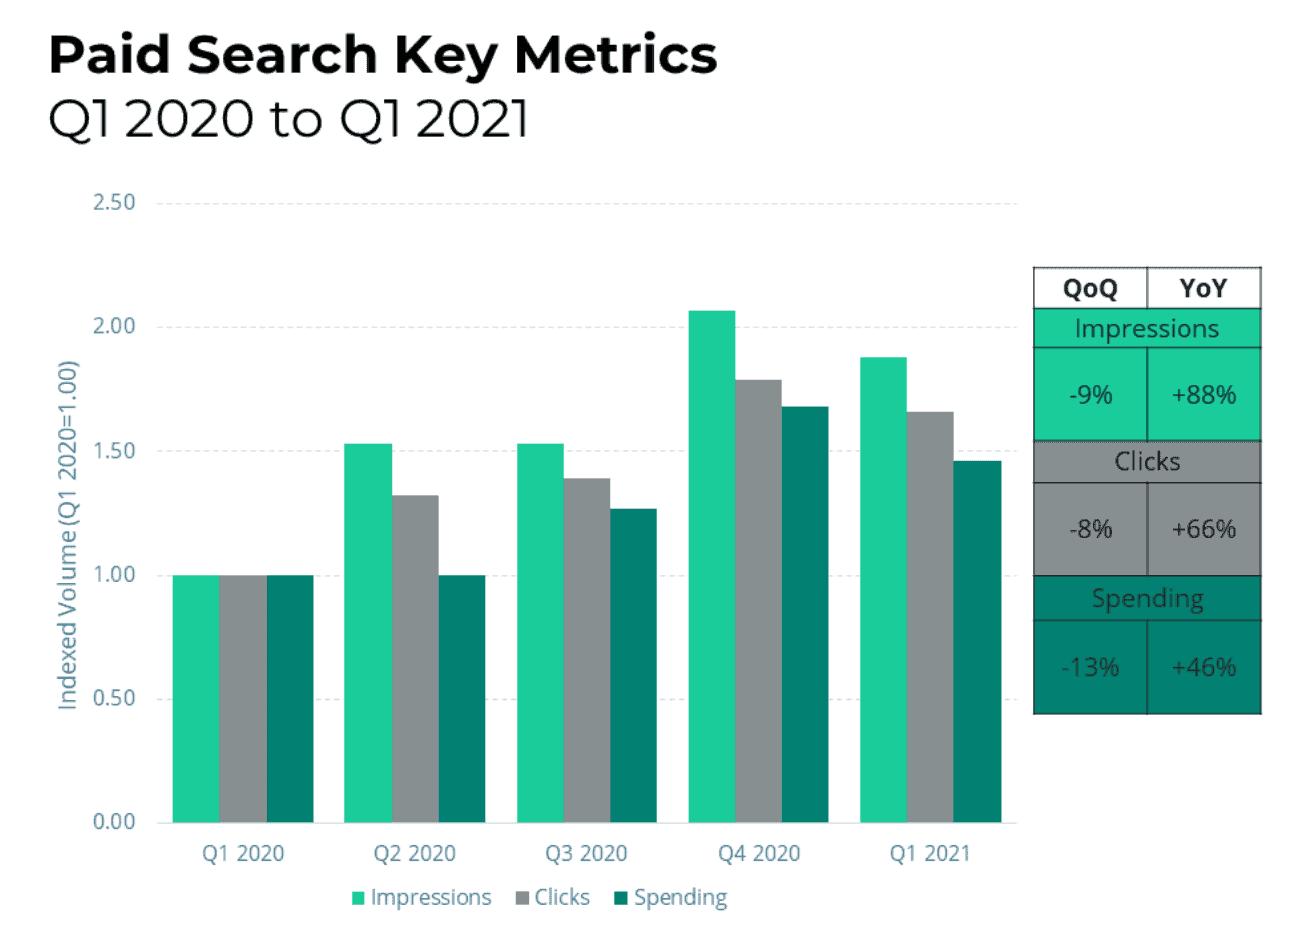 Q1 2021 Quarterly Trends